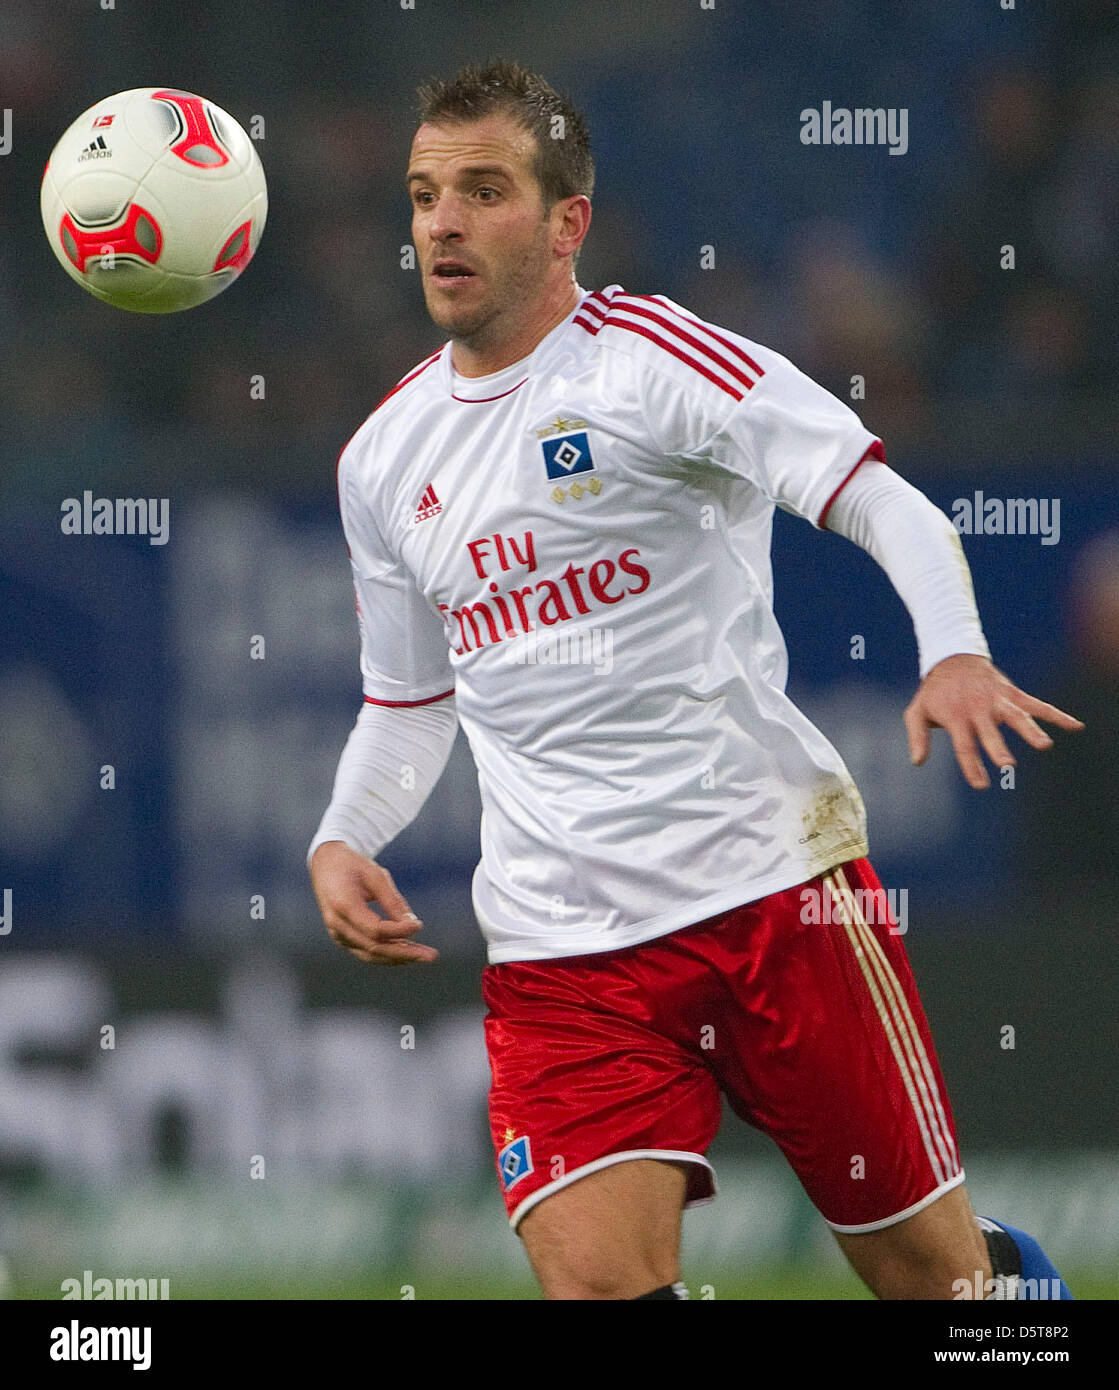 Hamburg's Rafael van der Vaart plays the ball during the Bundesliga soccer match between Hamburger SV and FSV Mainz Stock Photo